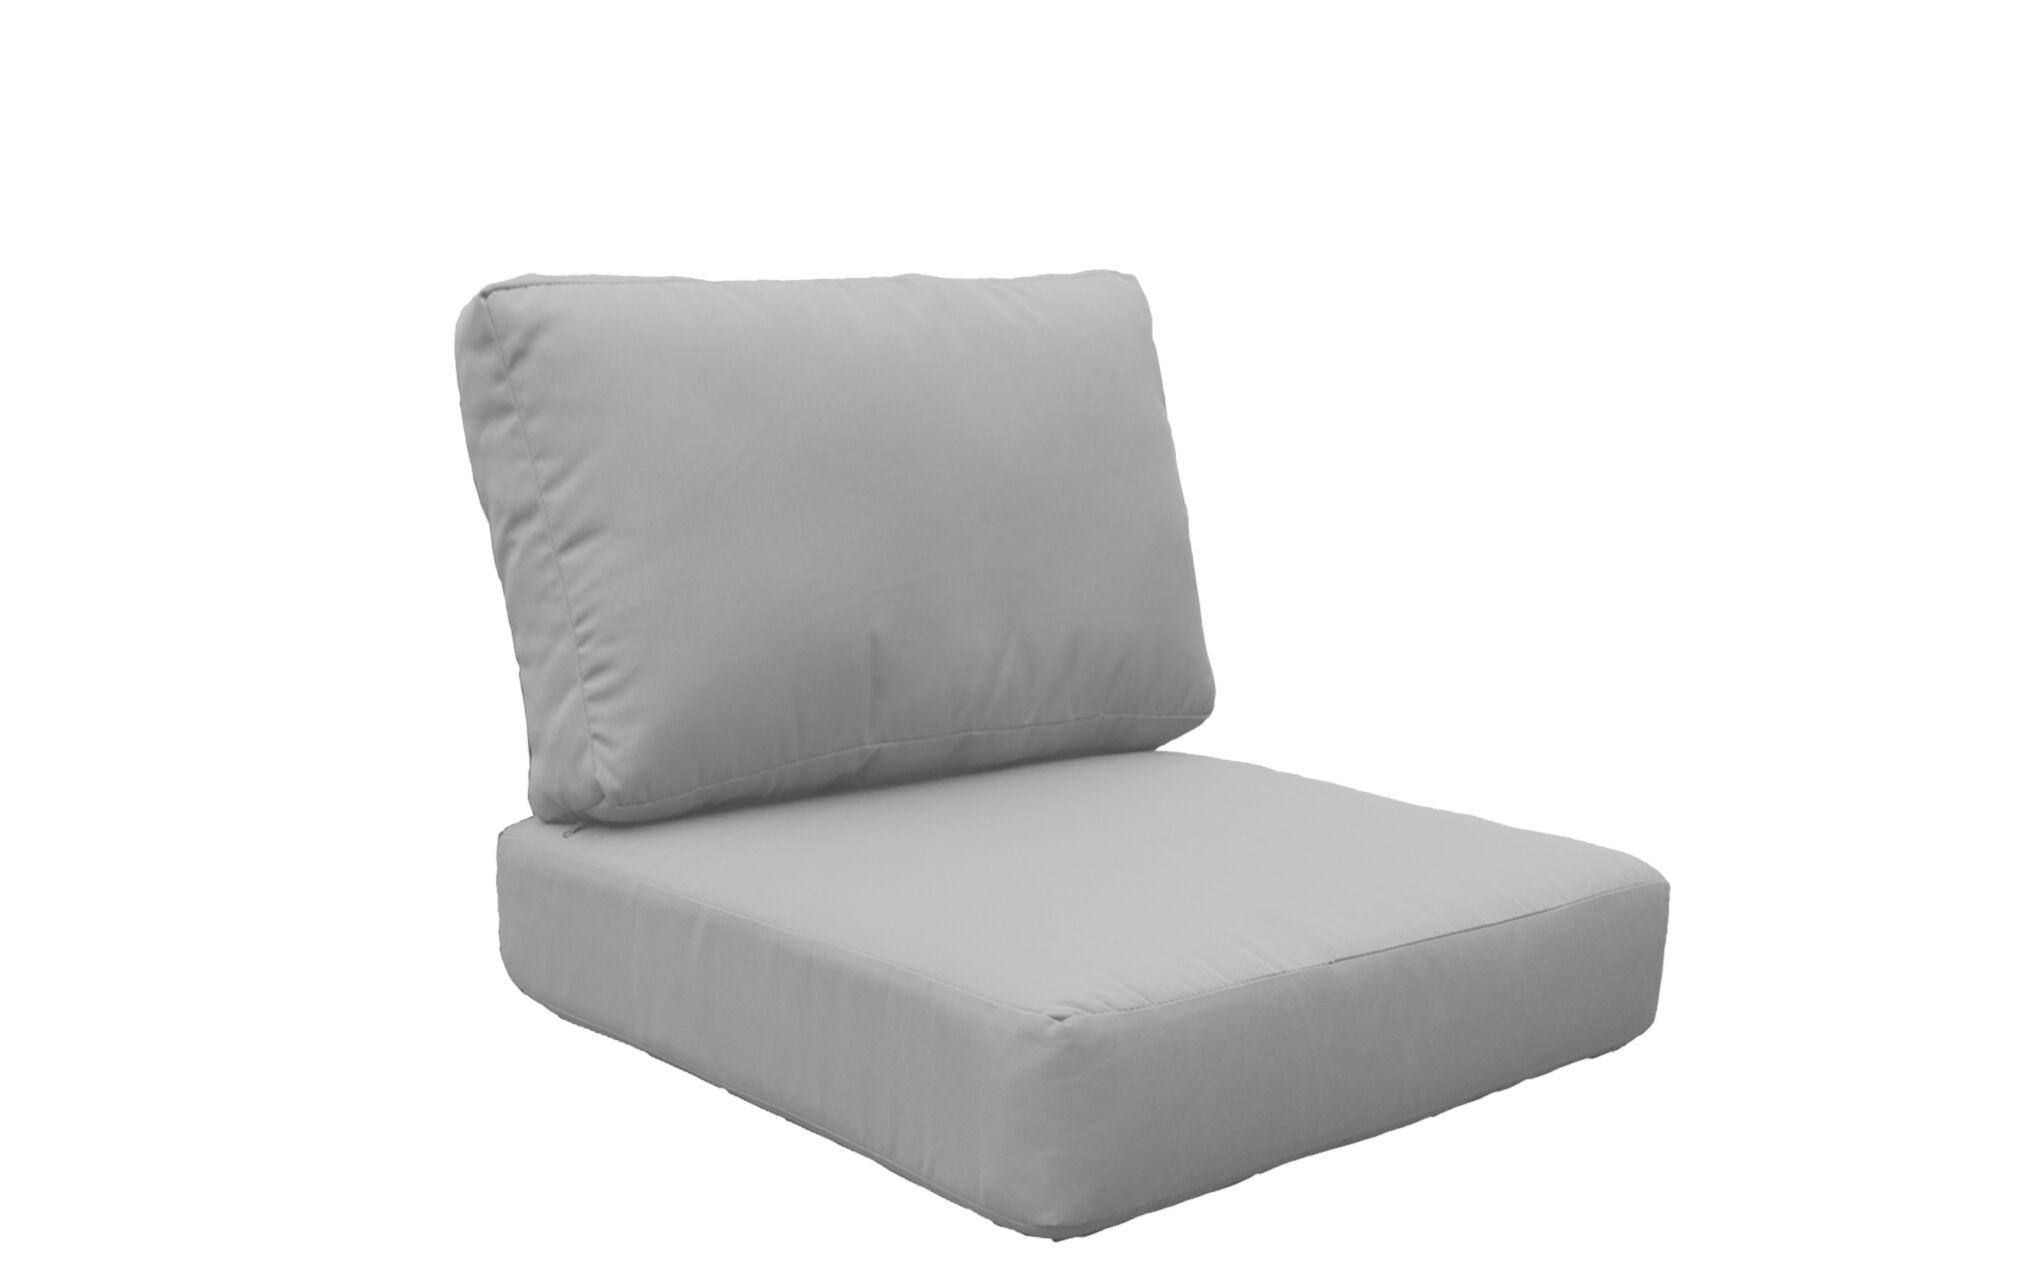 Coast 8 Piece Outdoor�Lounge Chair Cushion Set Fabric: Gray